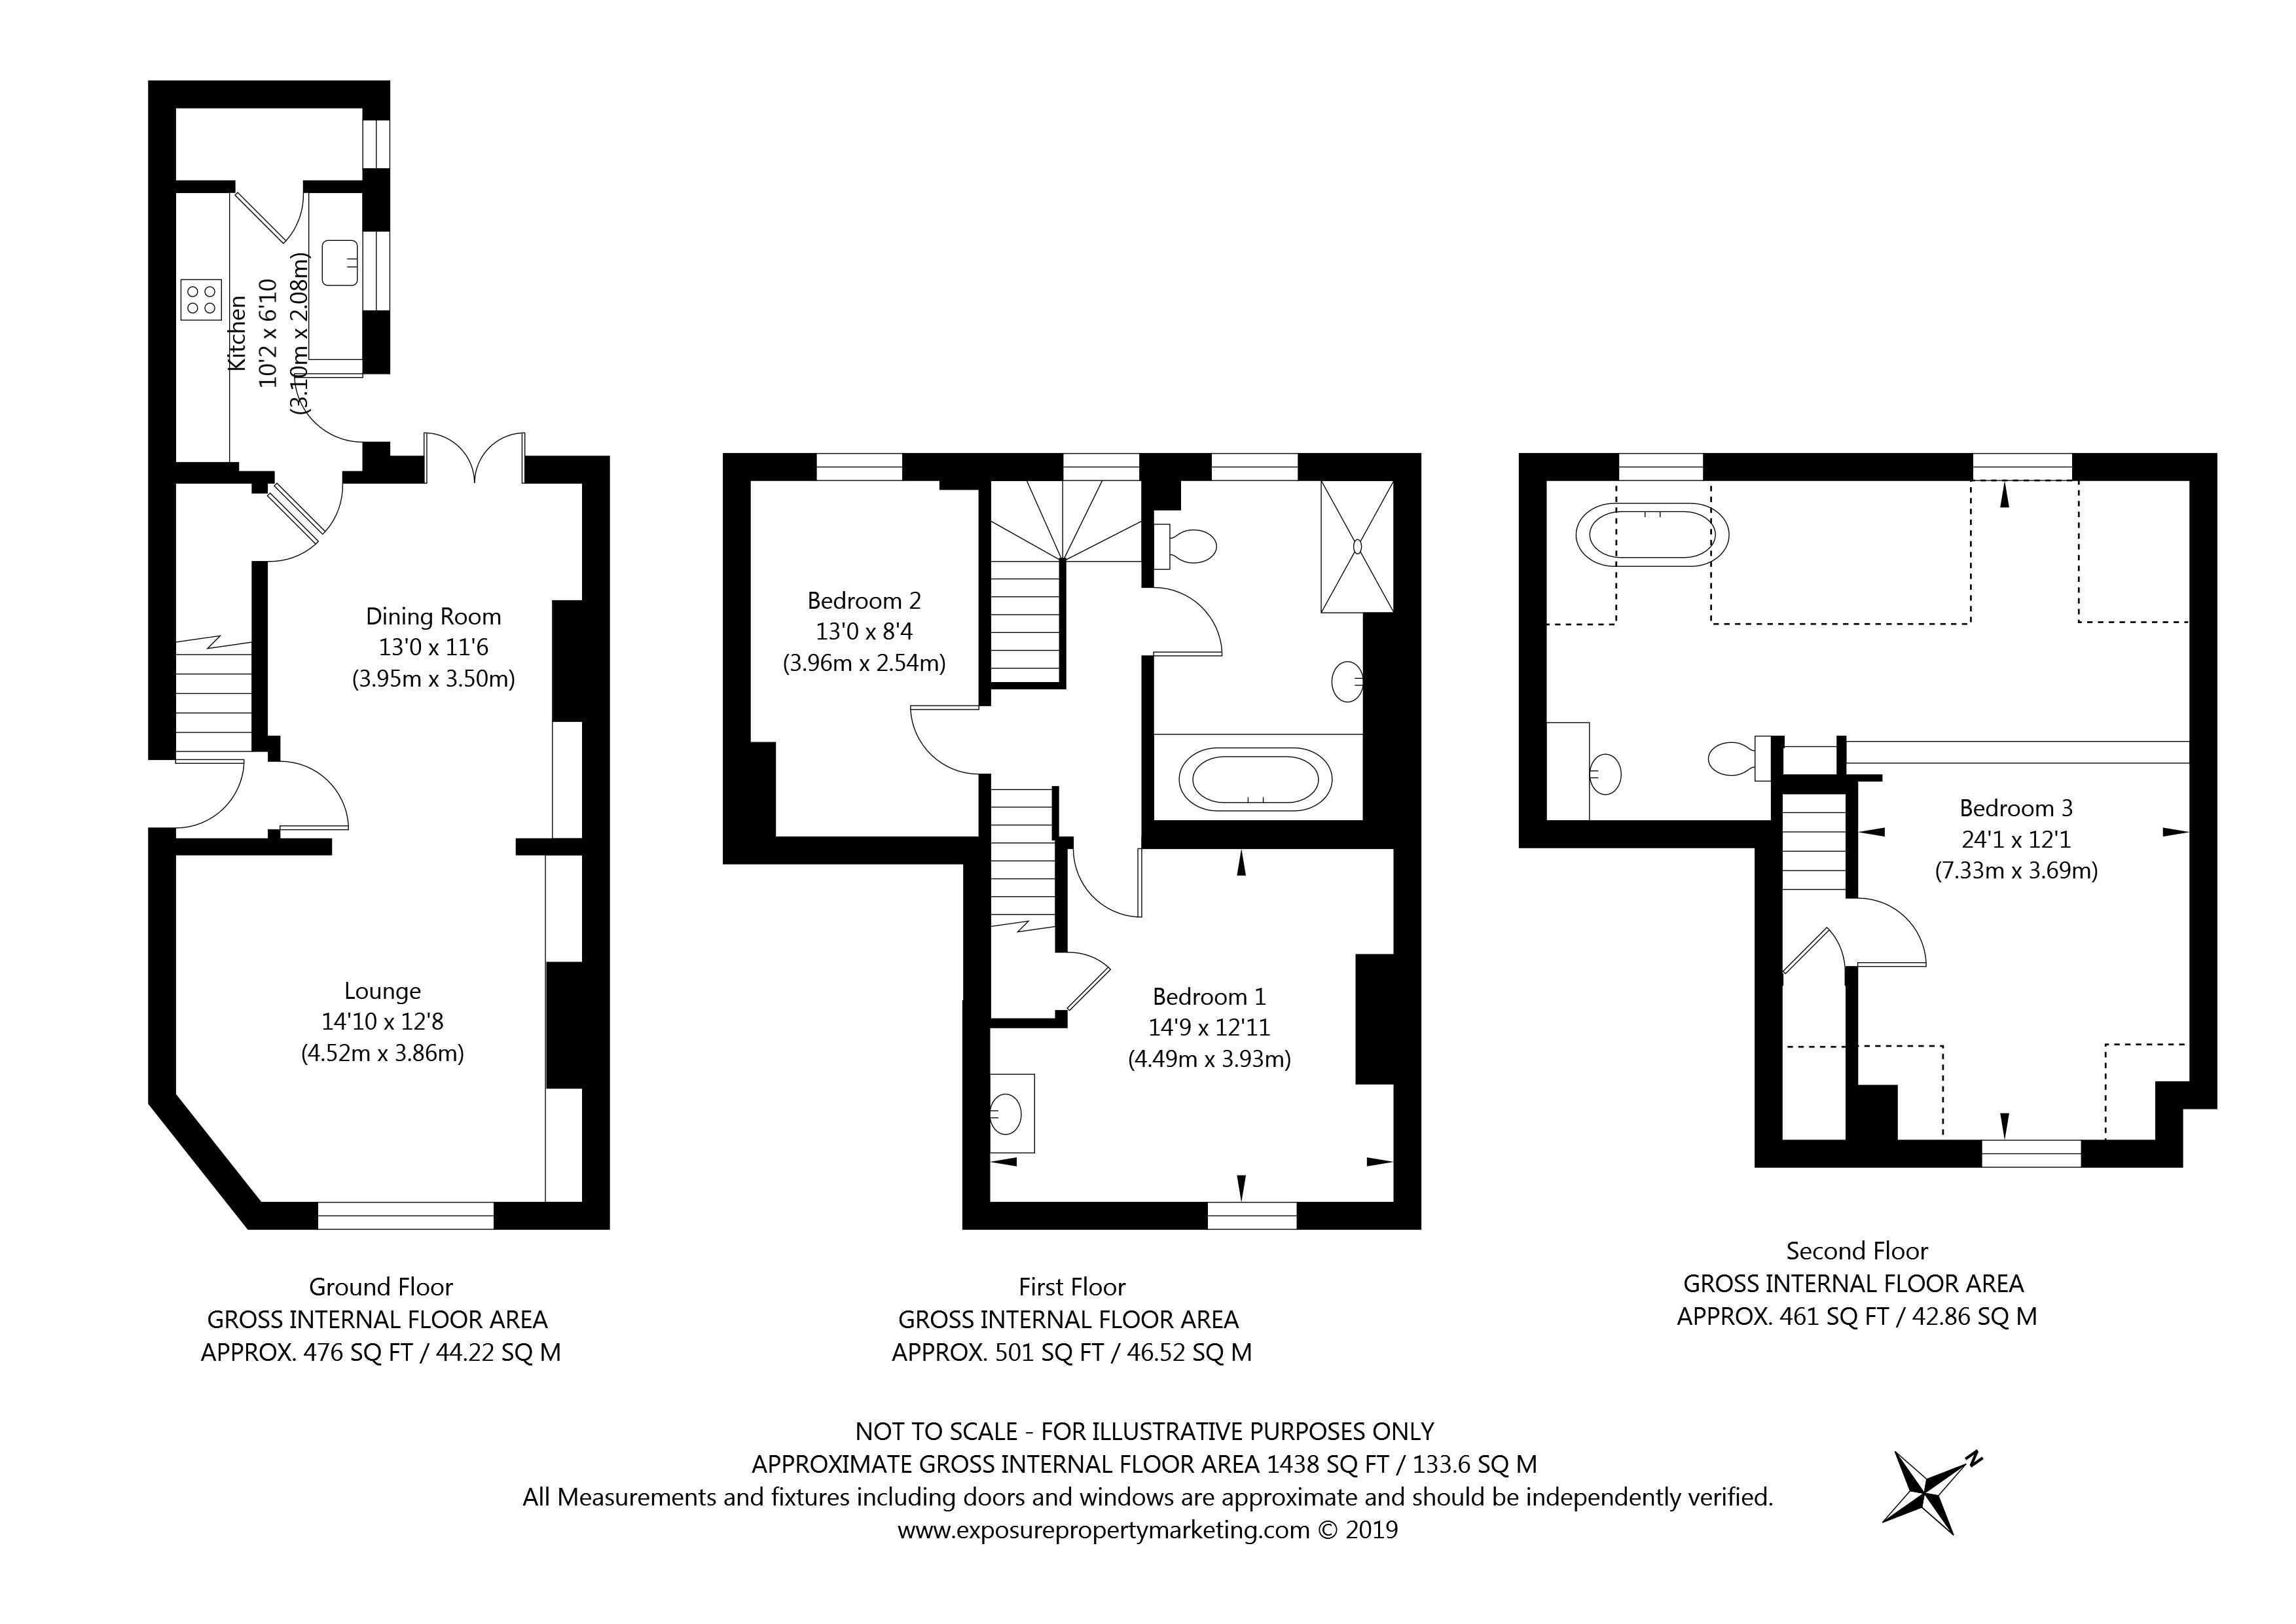 10 George Street, York property floorplan